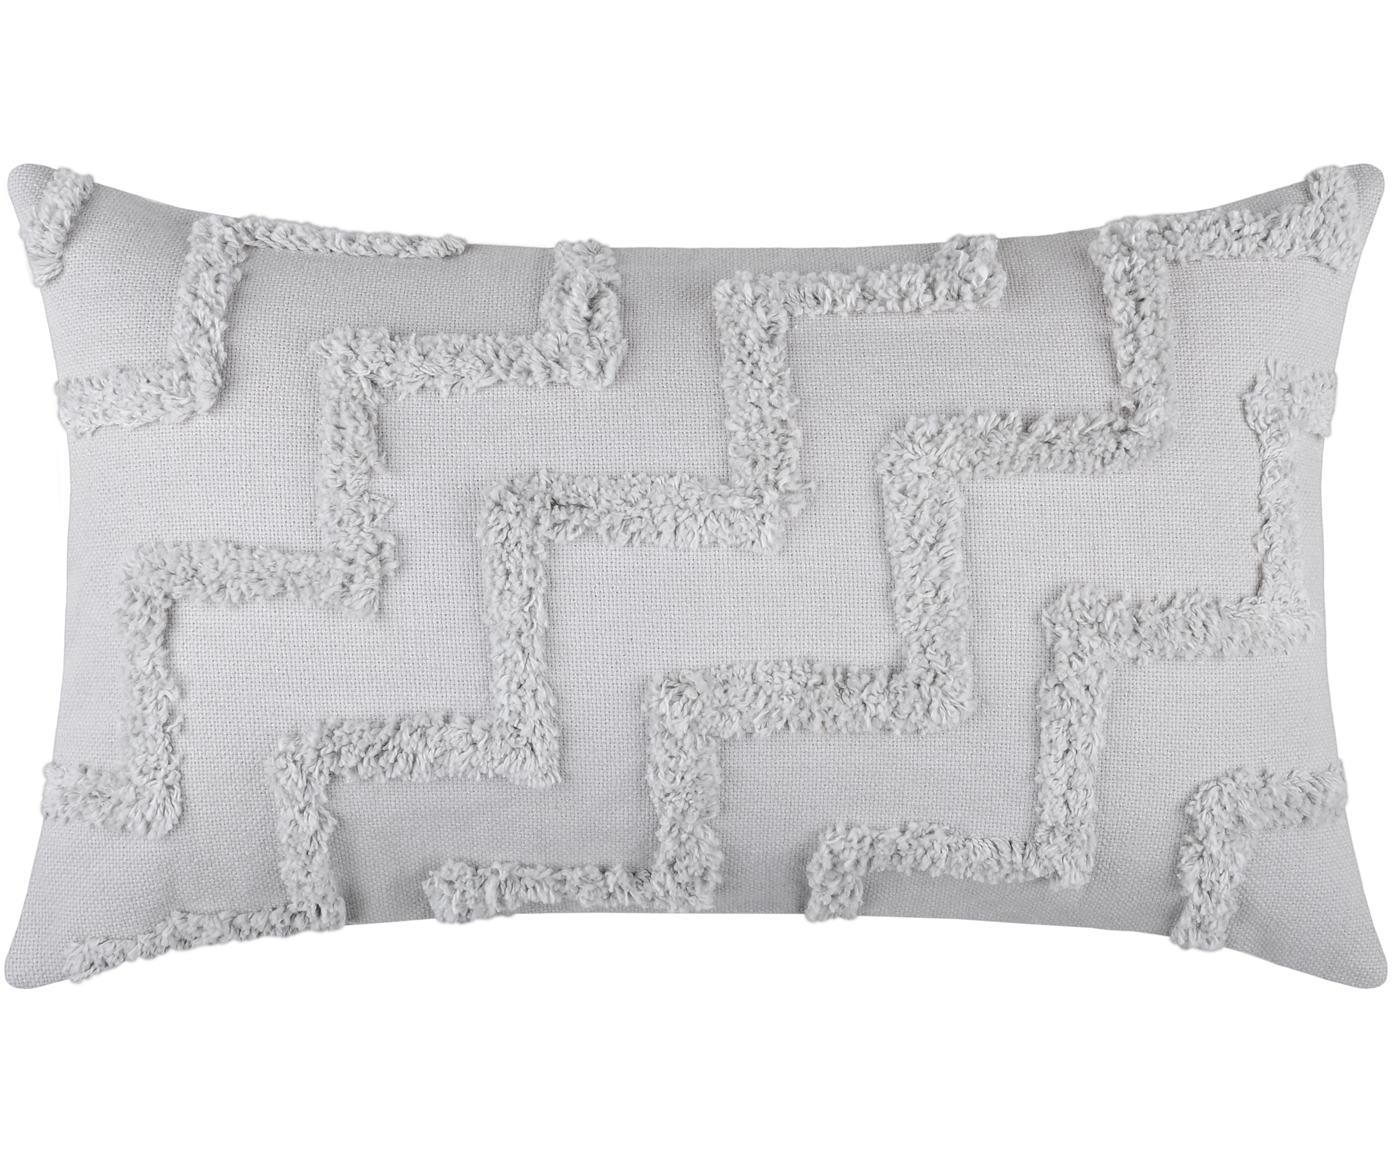 Cuscino con imbottitura Tiksi, Rivestimento: cotone, Grigio, Larg. 30 x Lung. 50 cm